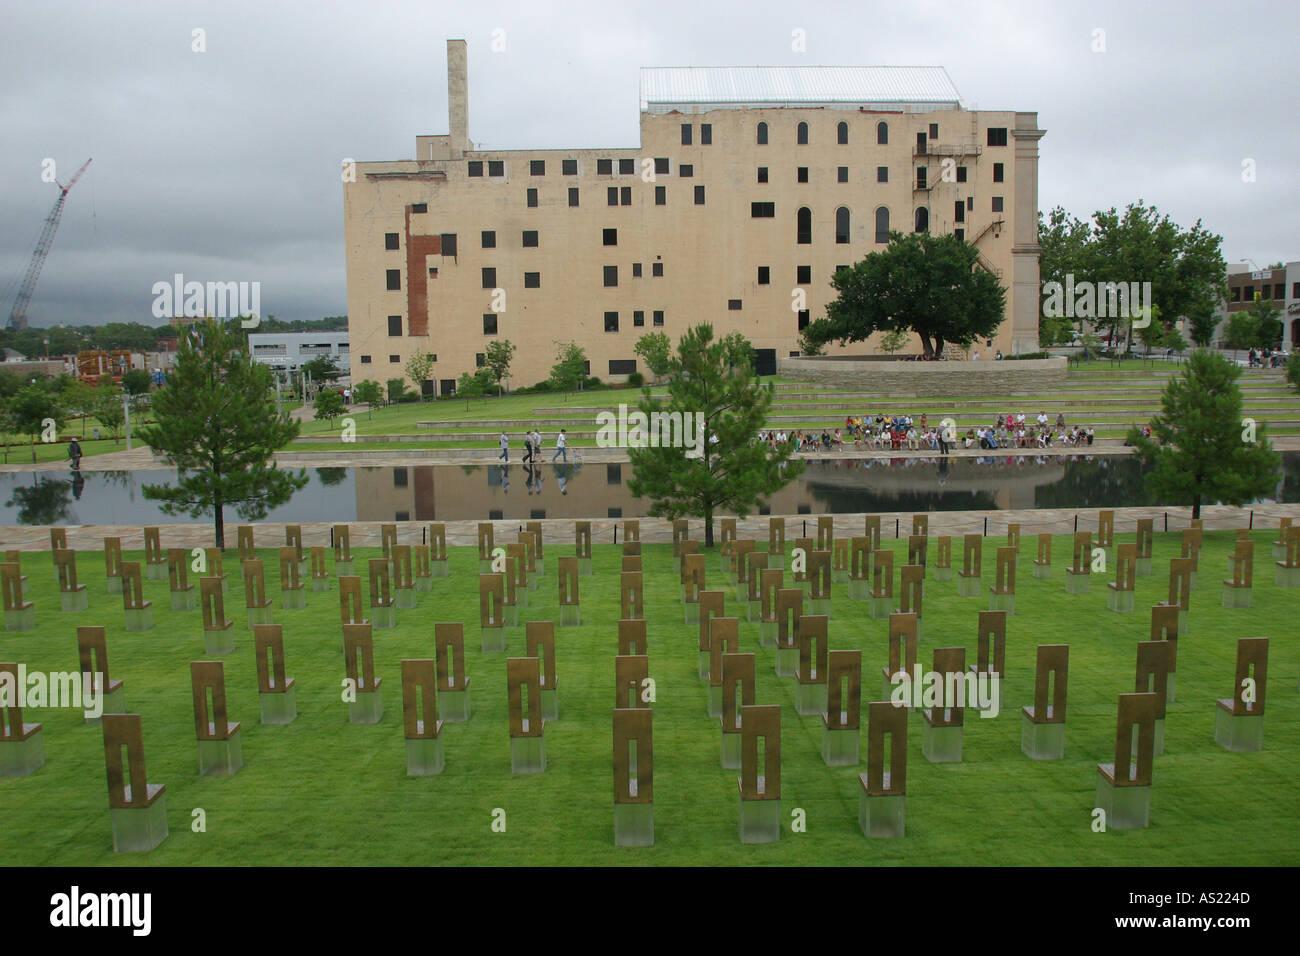 Oklahoma City bombing site memorial USA Each chair represents a victim Stock Photo